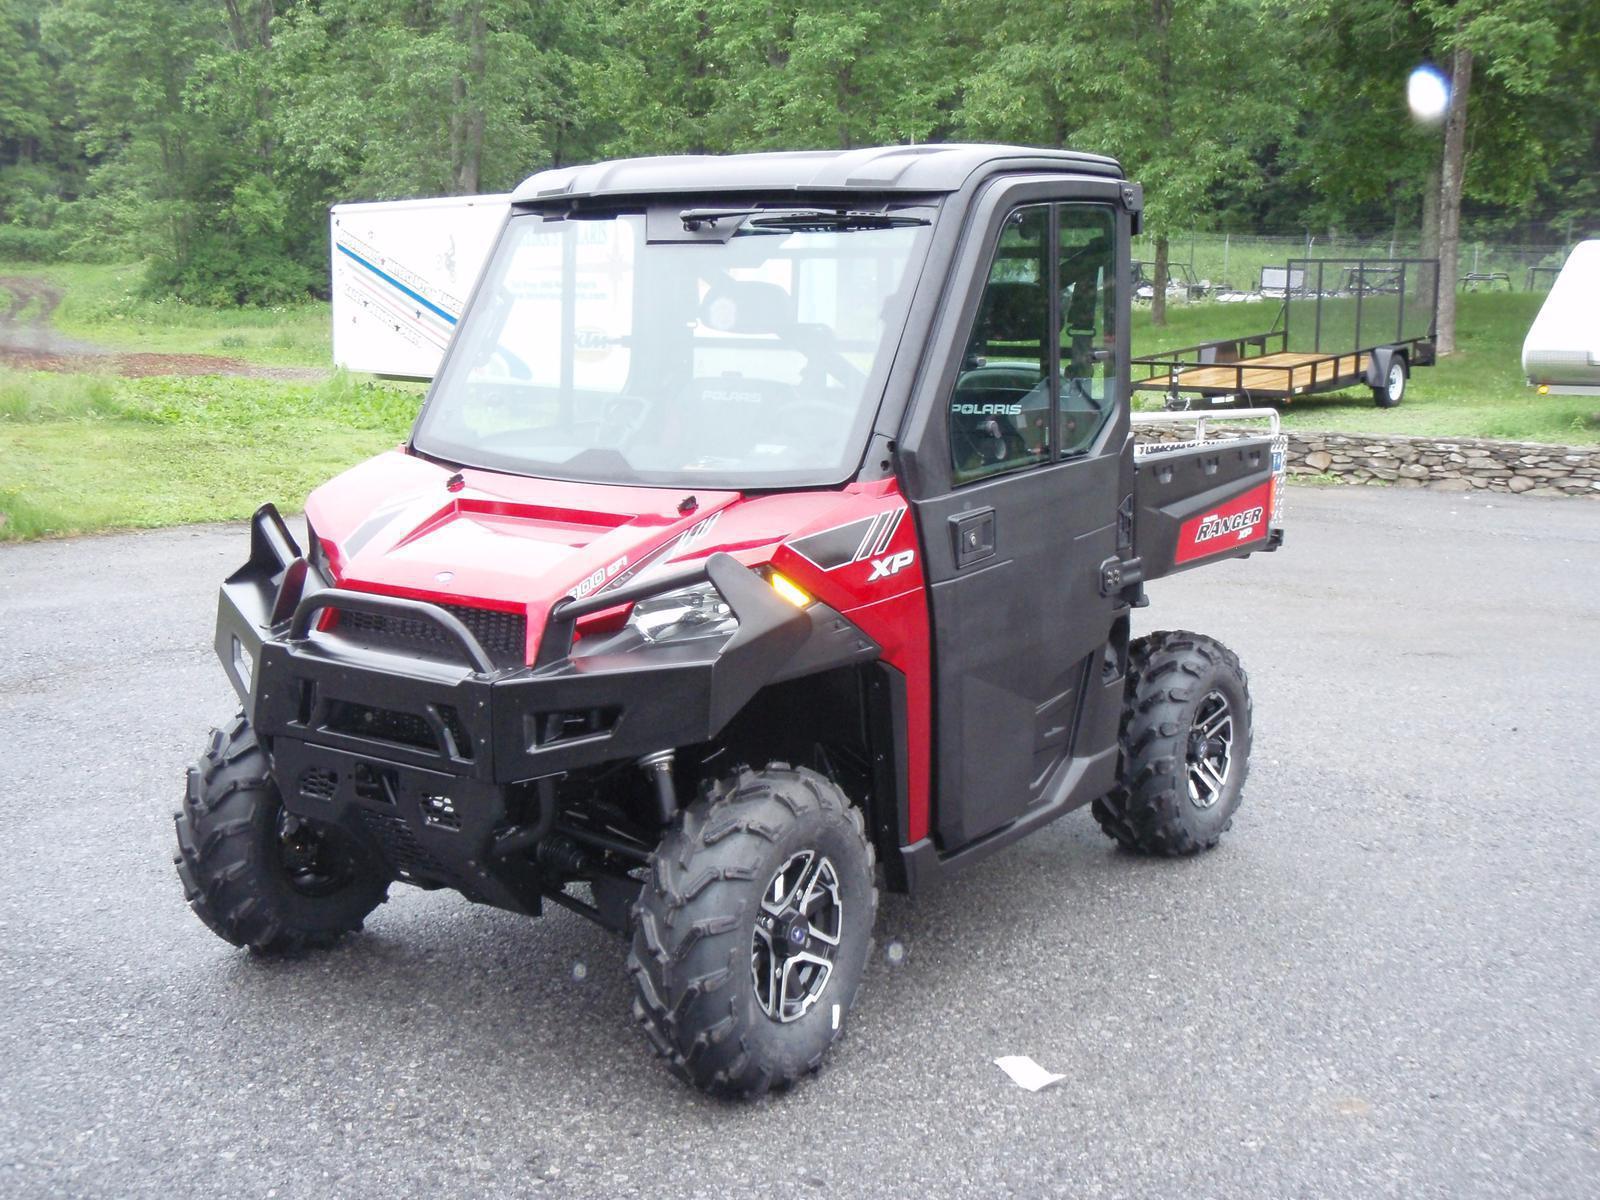 2014 Polaris Ranger XP 900 EMS Vehicle